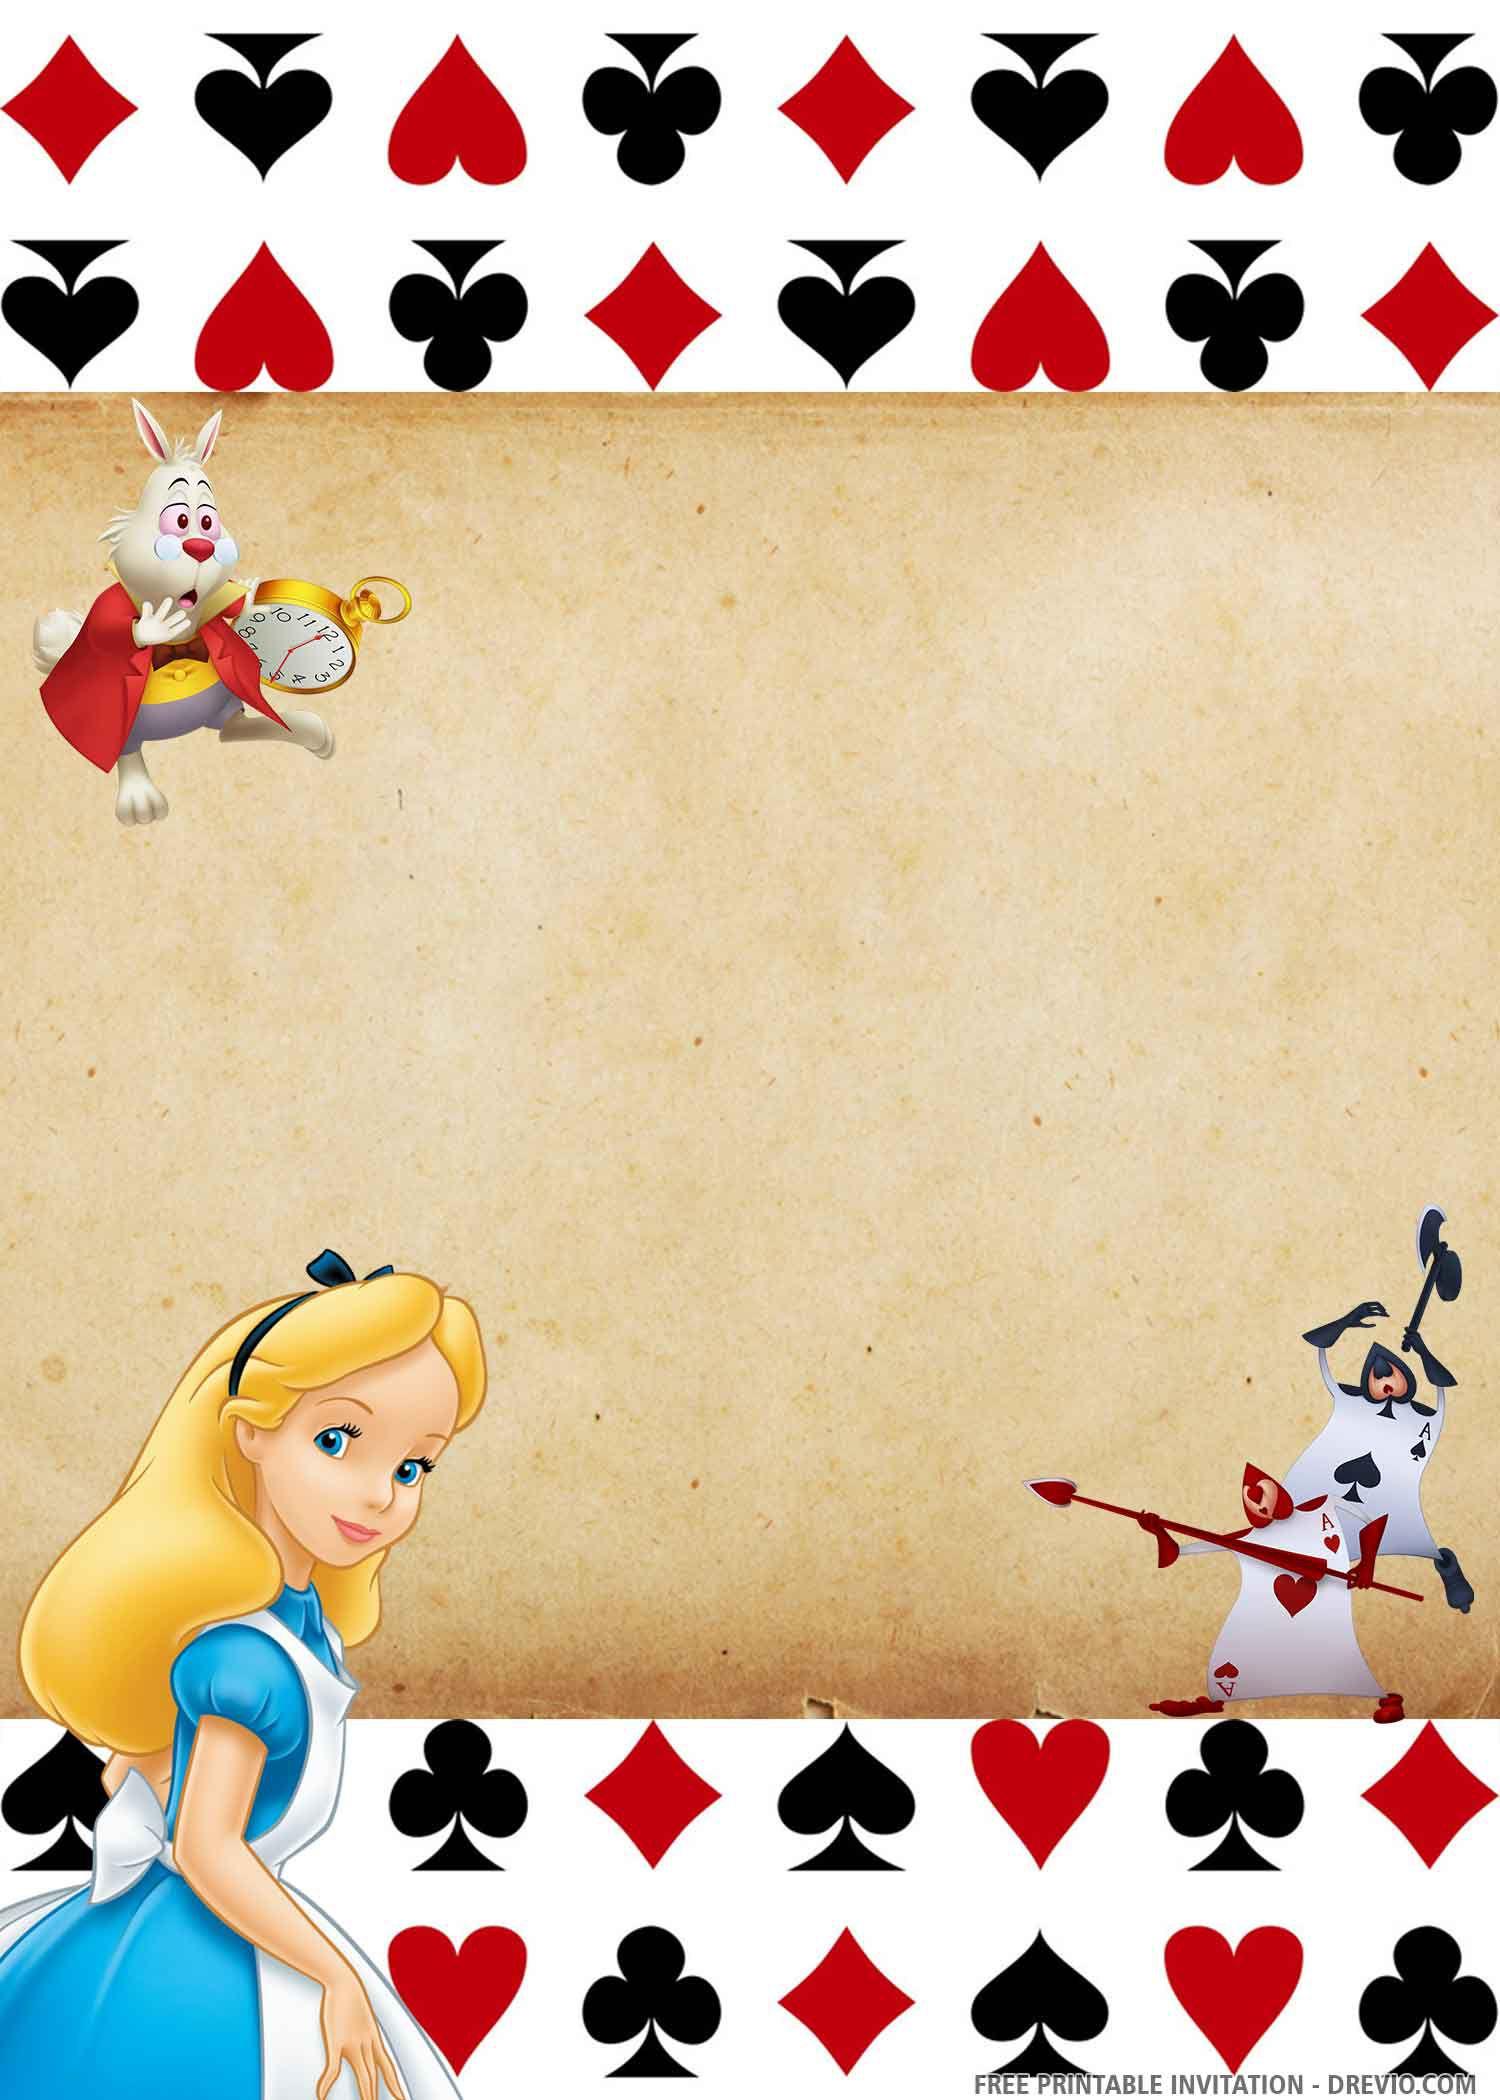 008 Breathtaking Alice In Wonderland Invite Template Photo  Party Invitation FreeFull